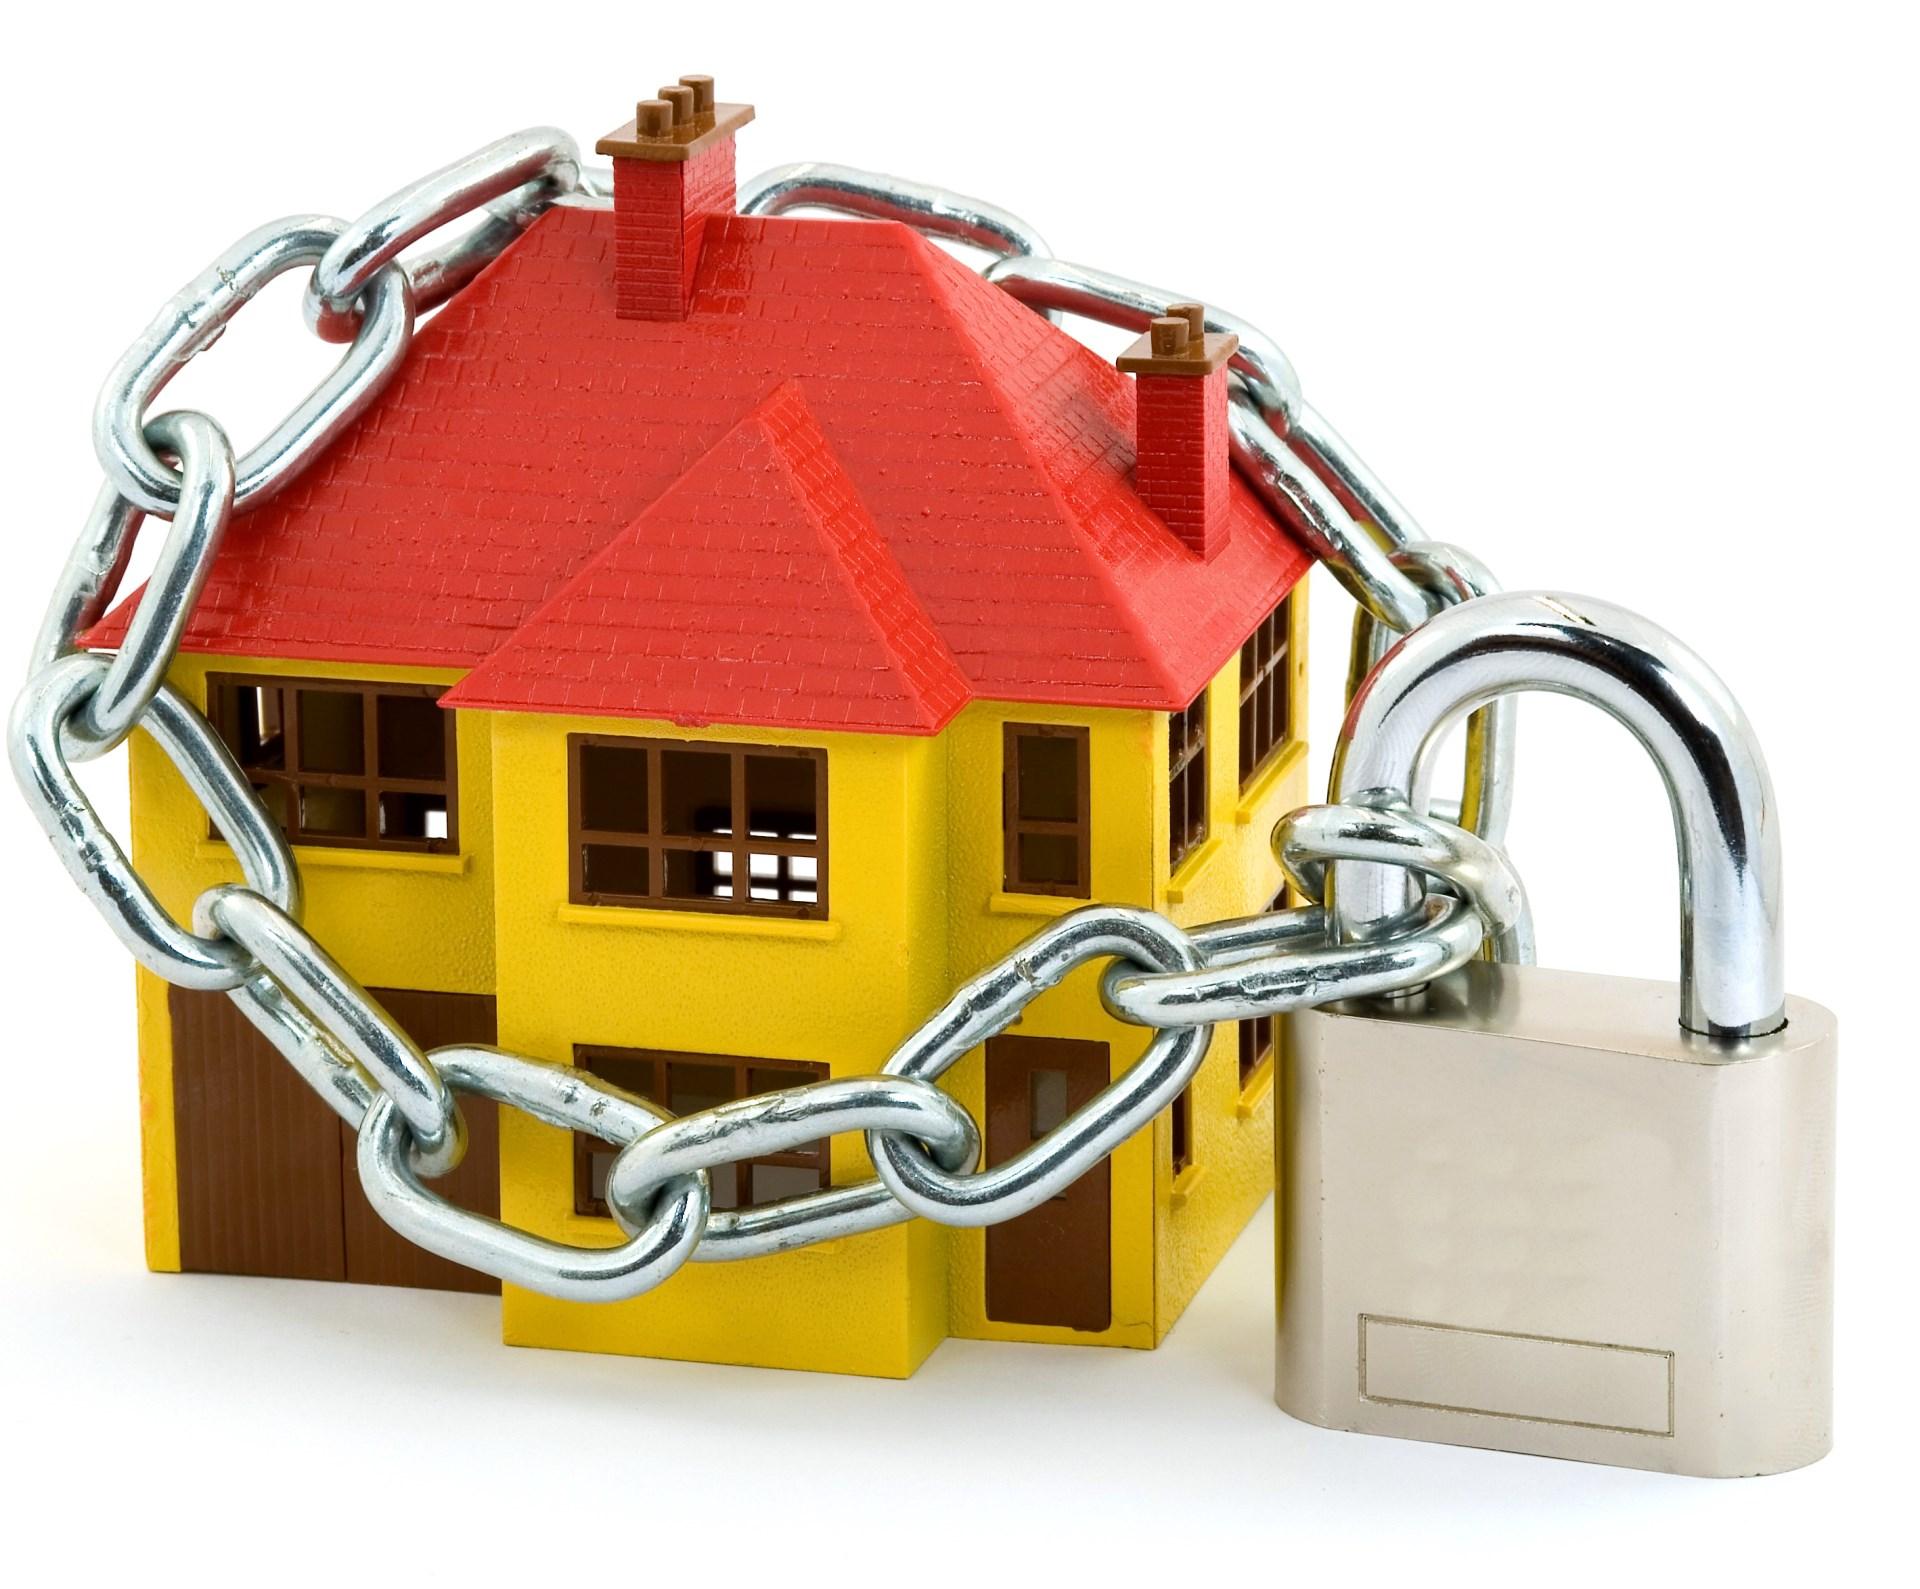 zabezpečený dům